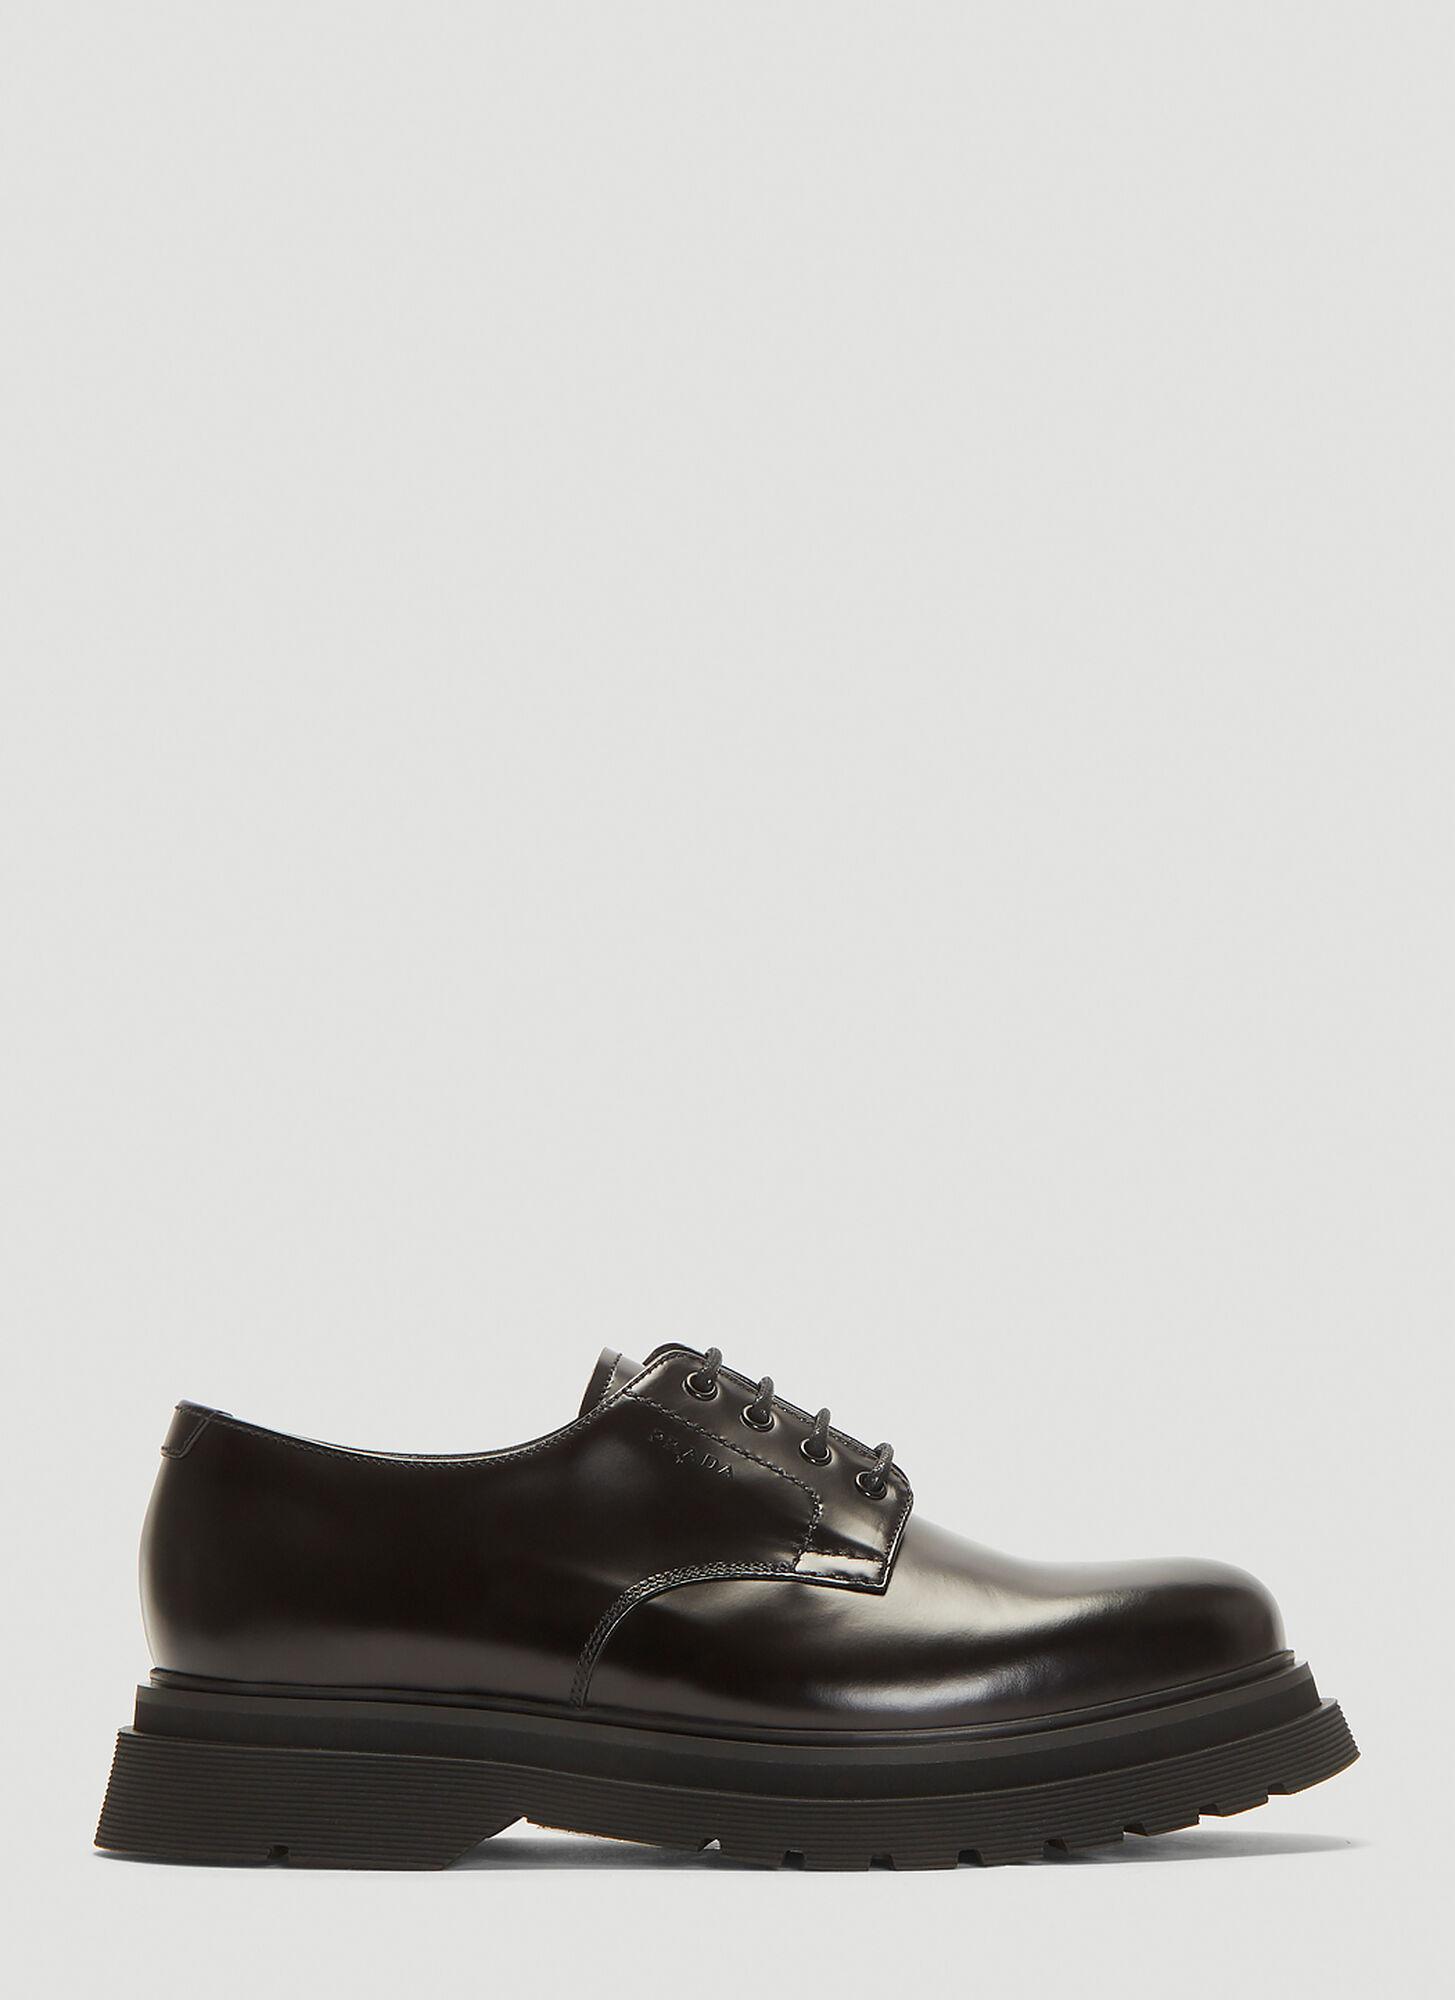 Prada Derby Shoes in Black size UK 07